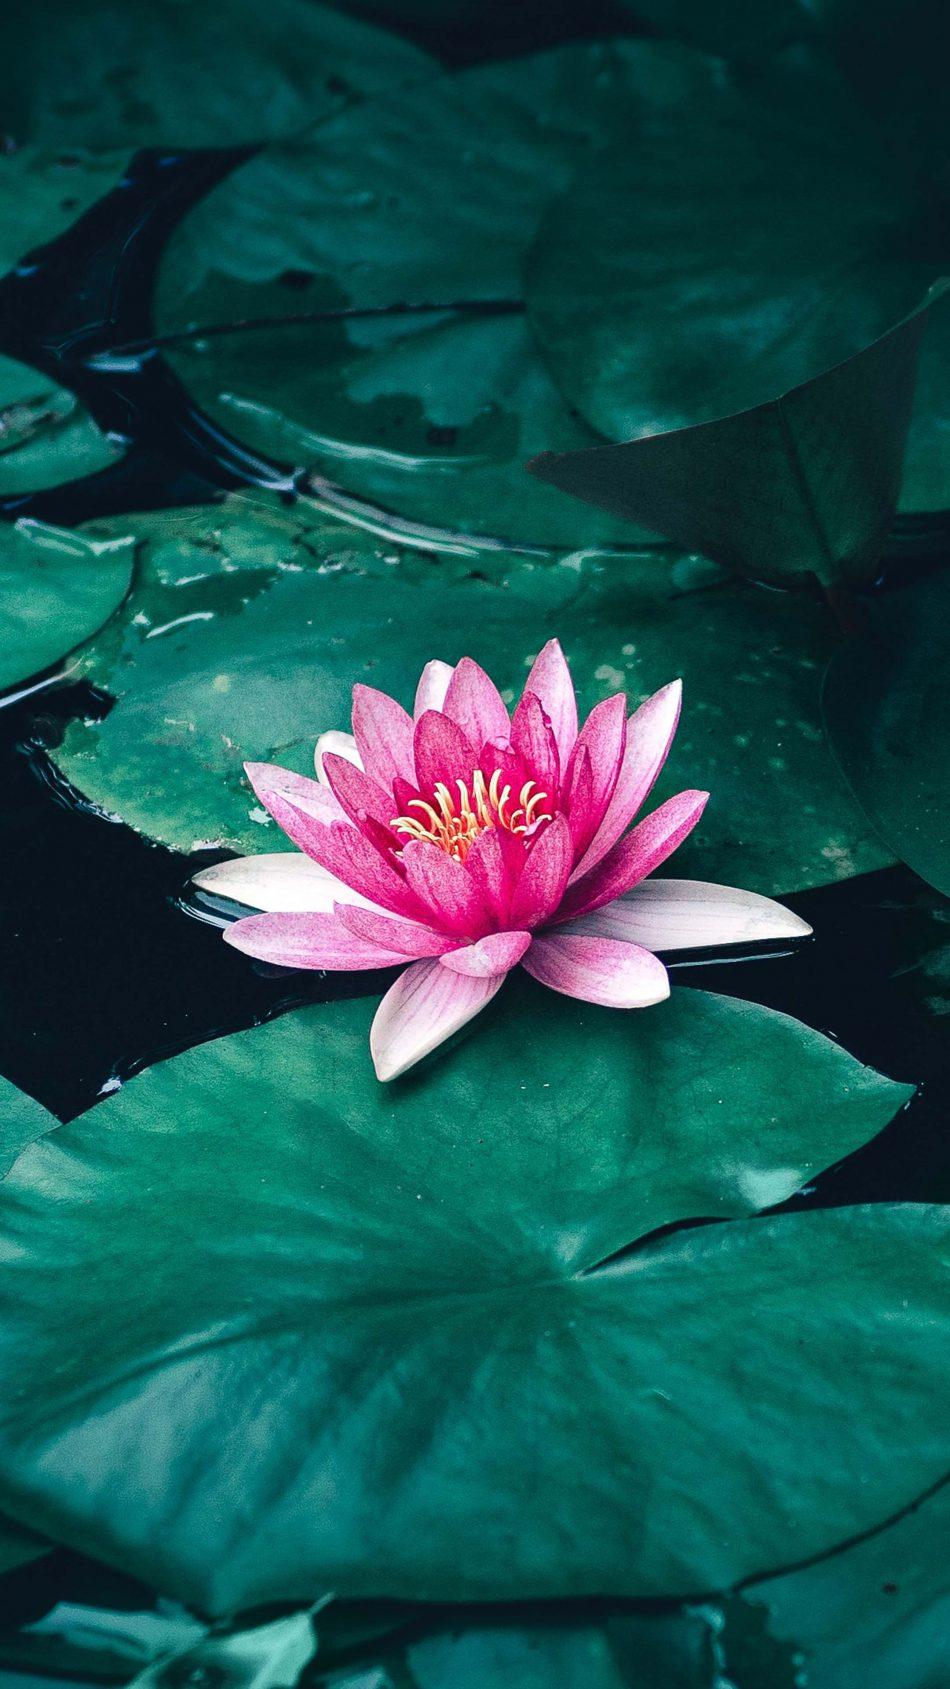 Lotus Flower Leaves Lake 4K Ultra HD Mobile Wallpaper